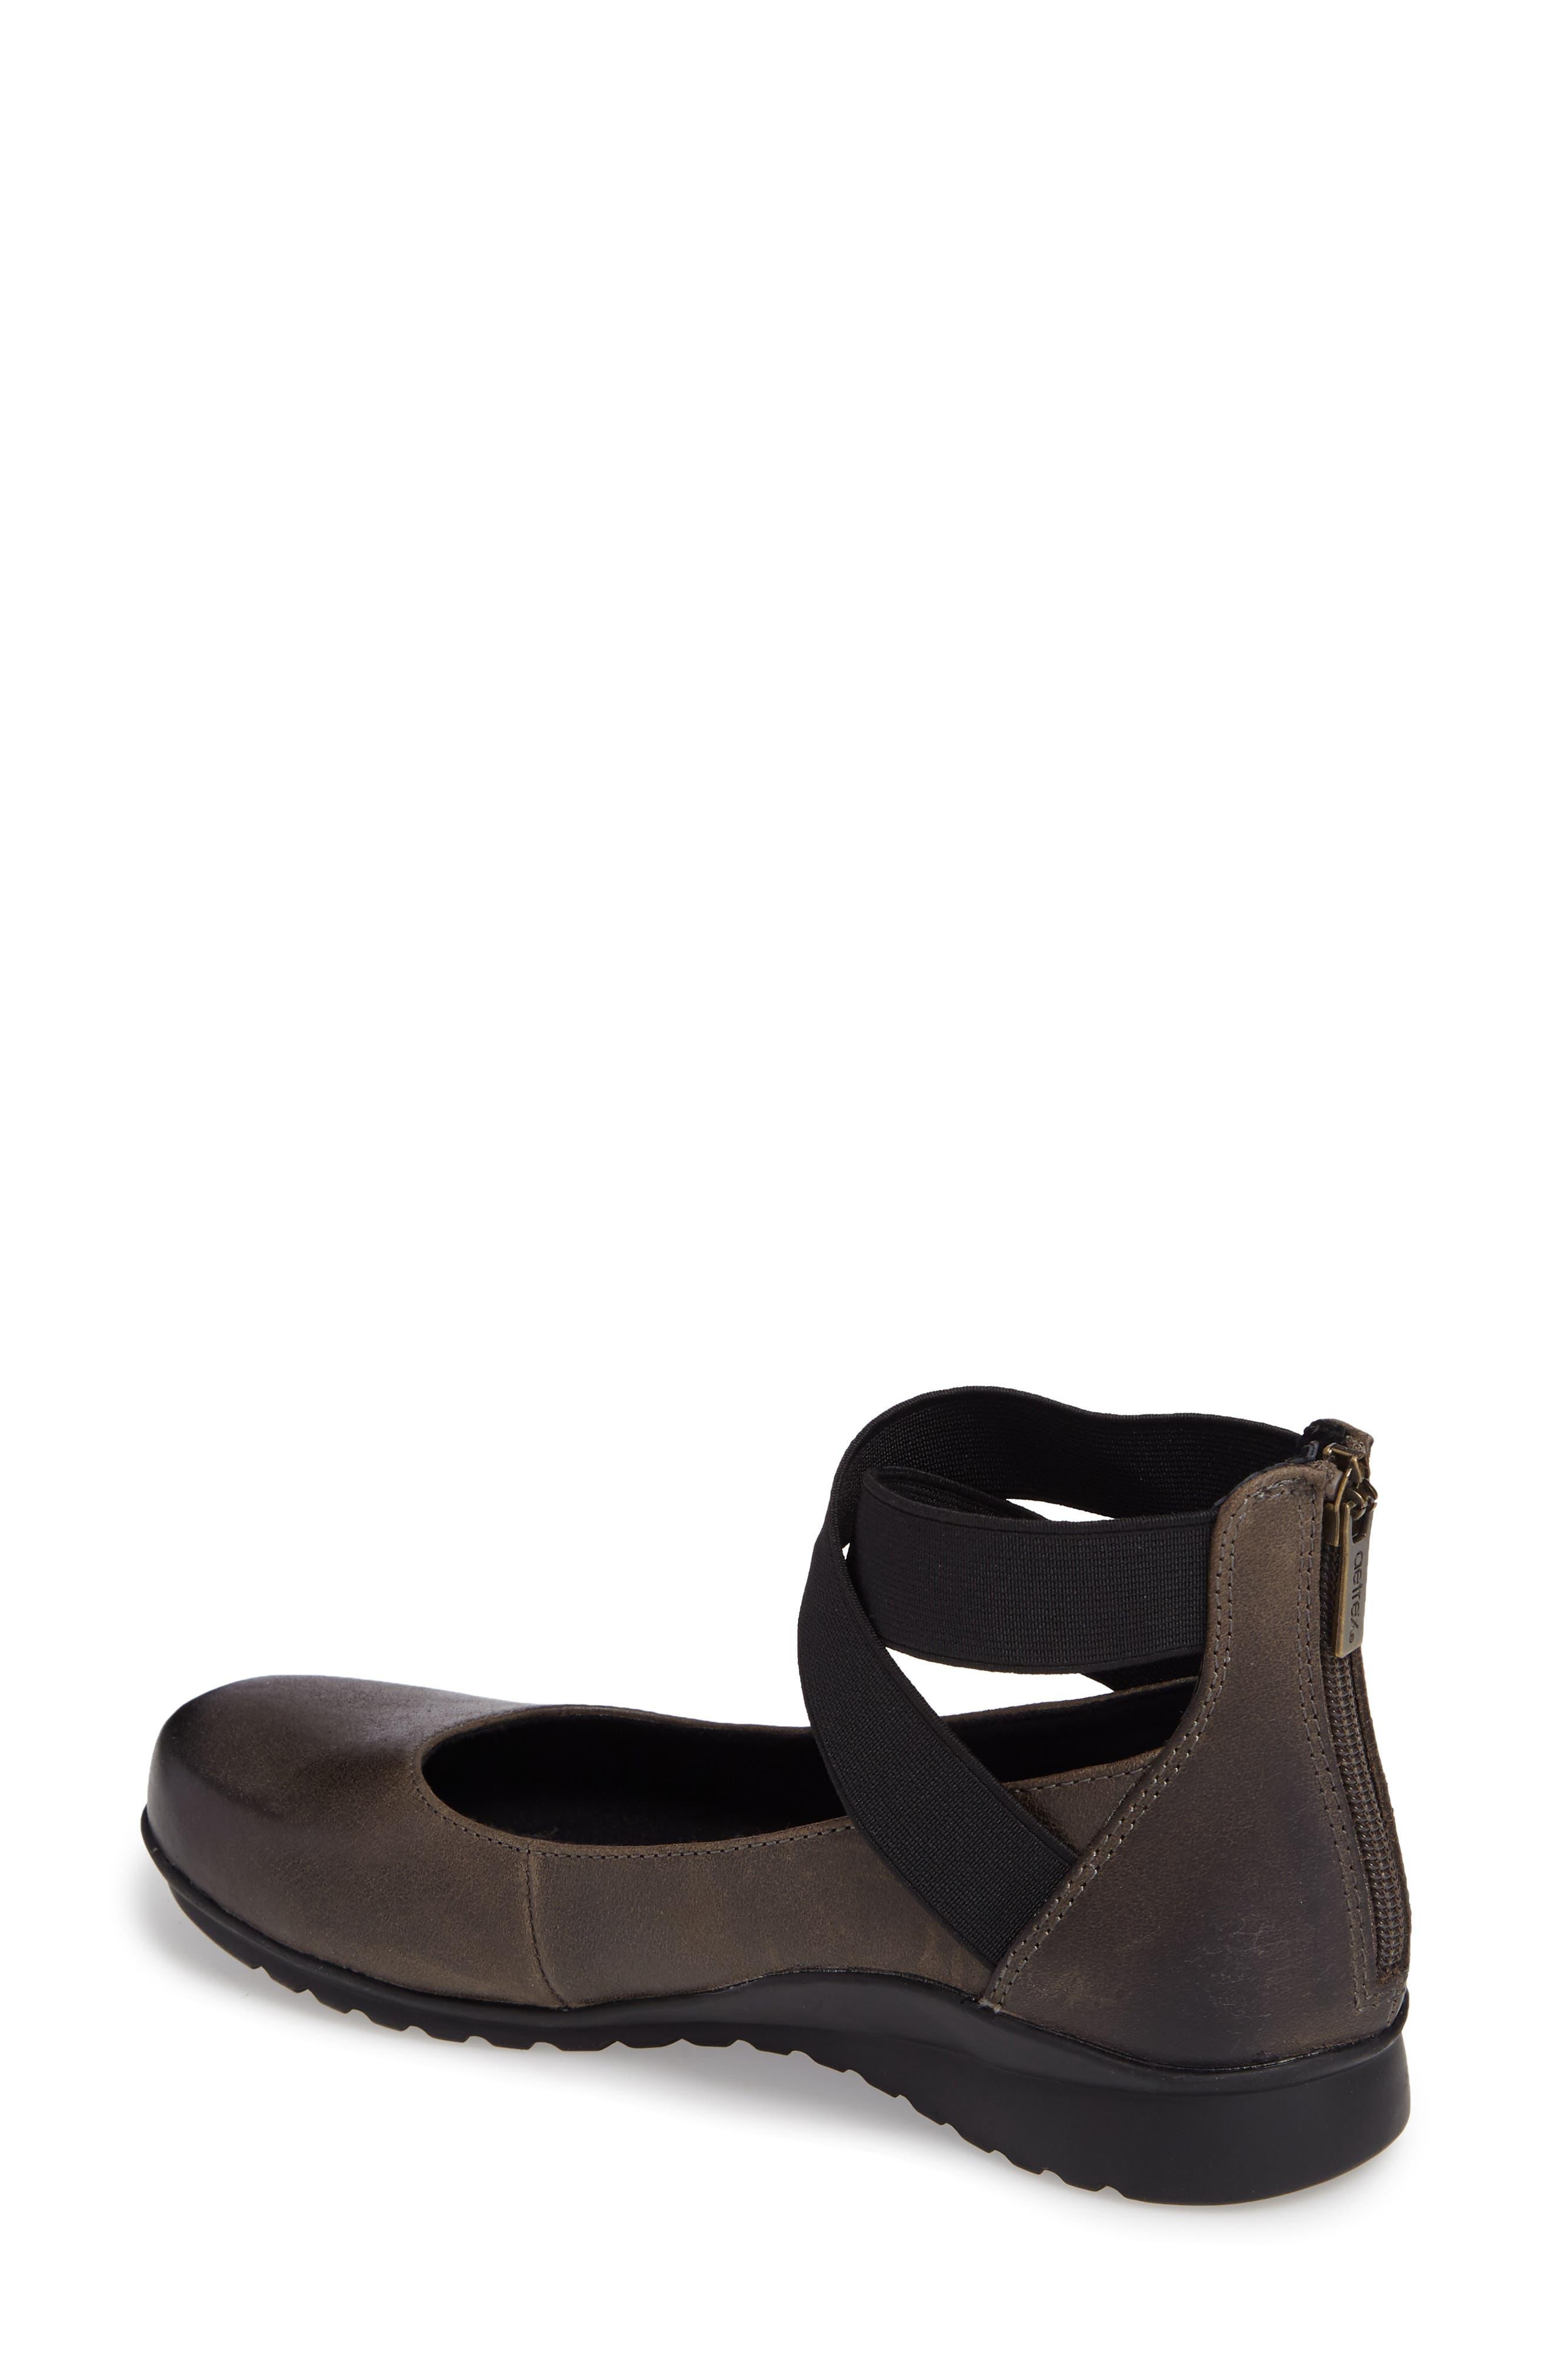 'Dakota' Ankle Strap Ballet Flat,                             Alternate thumbnail 2, color,                             Iron Leather